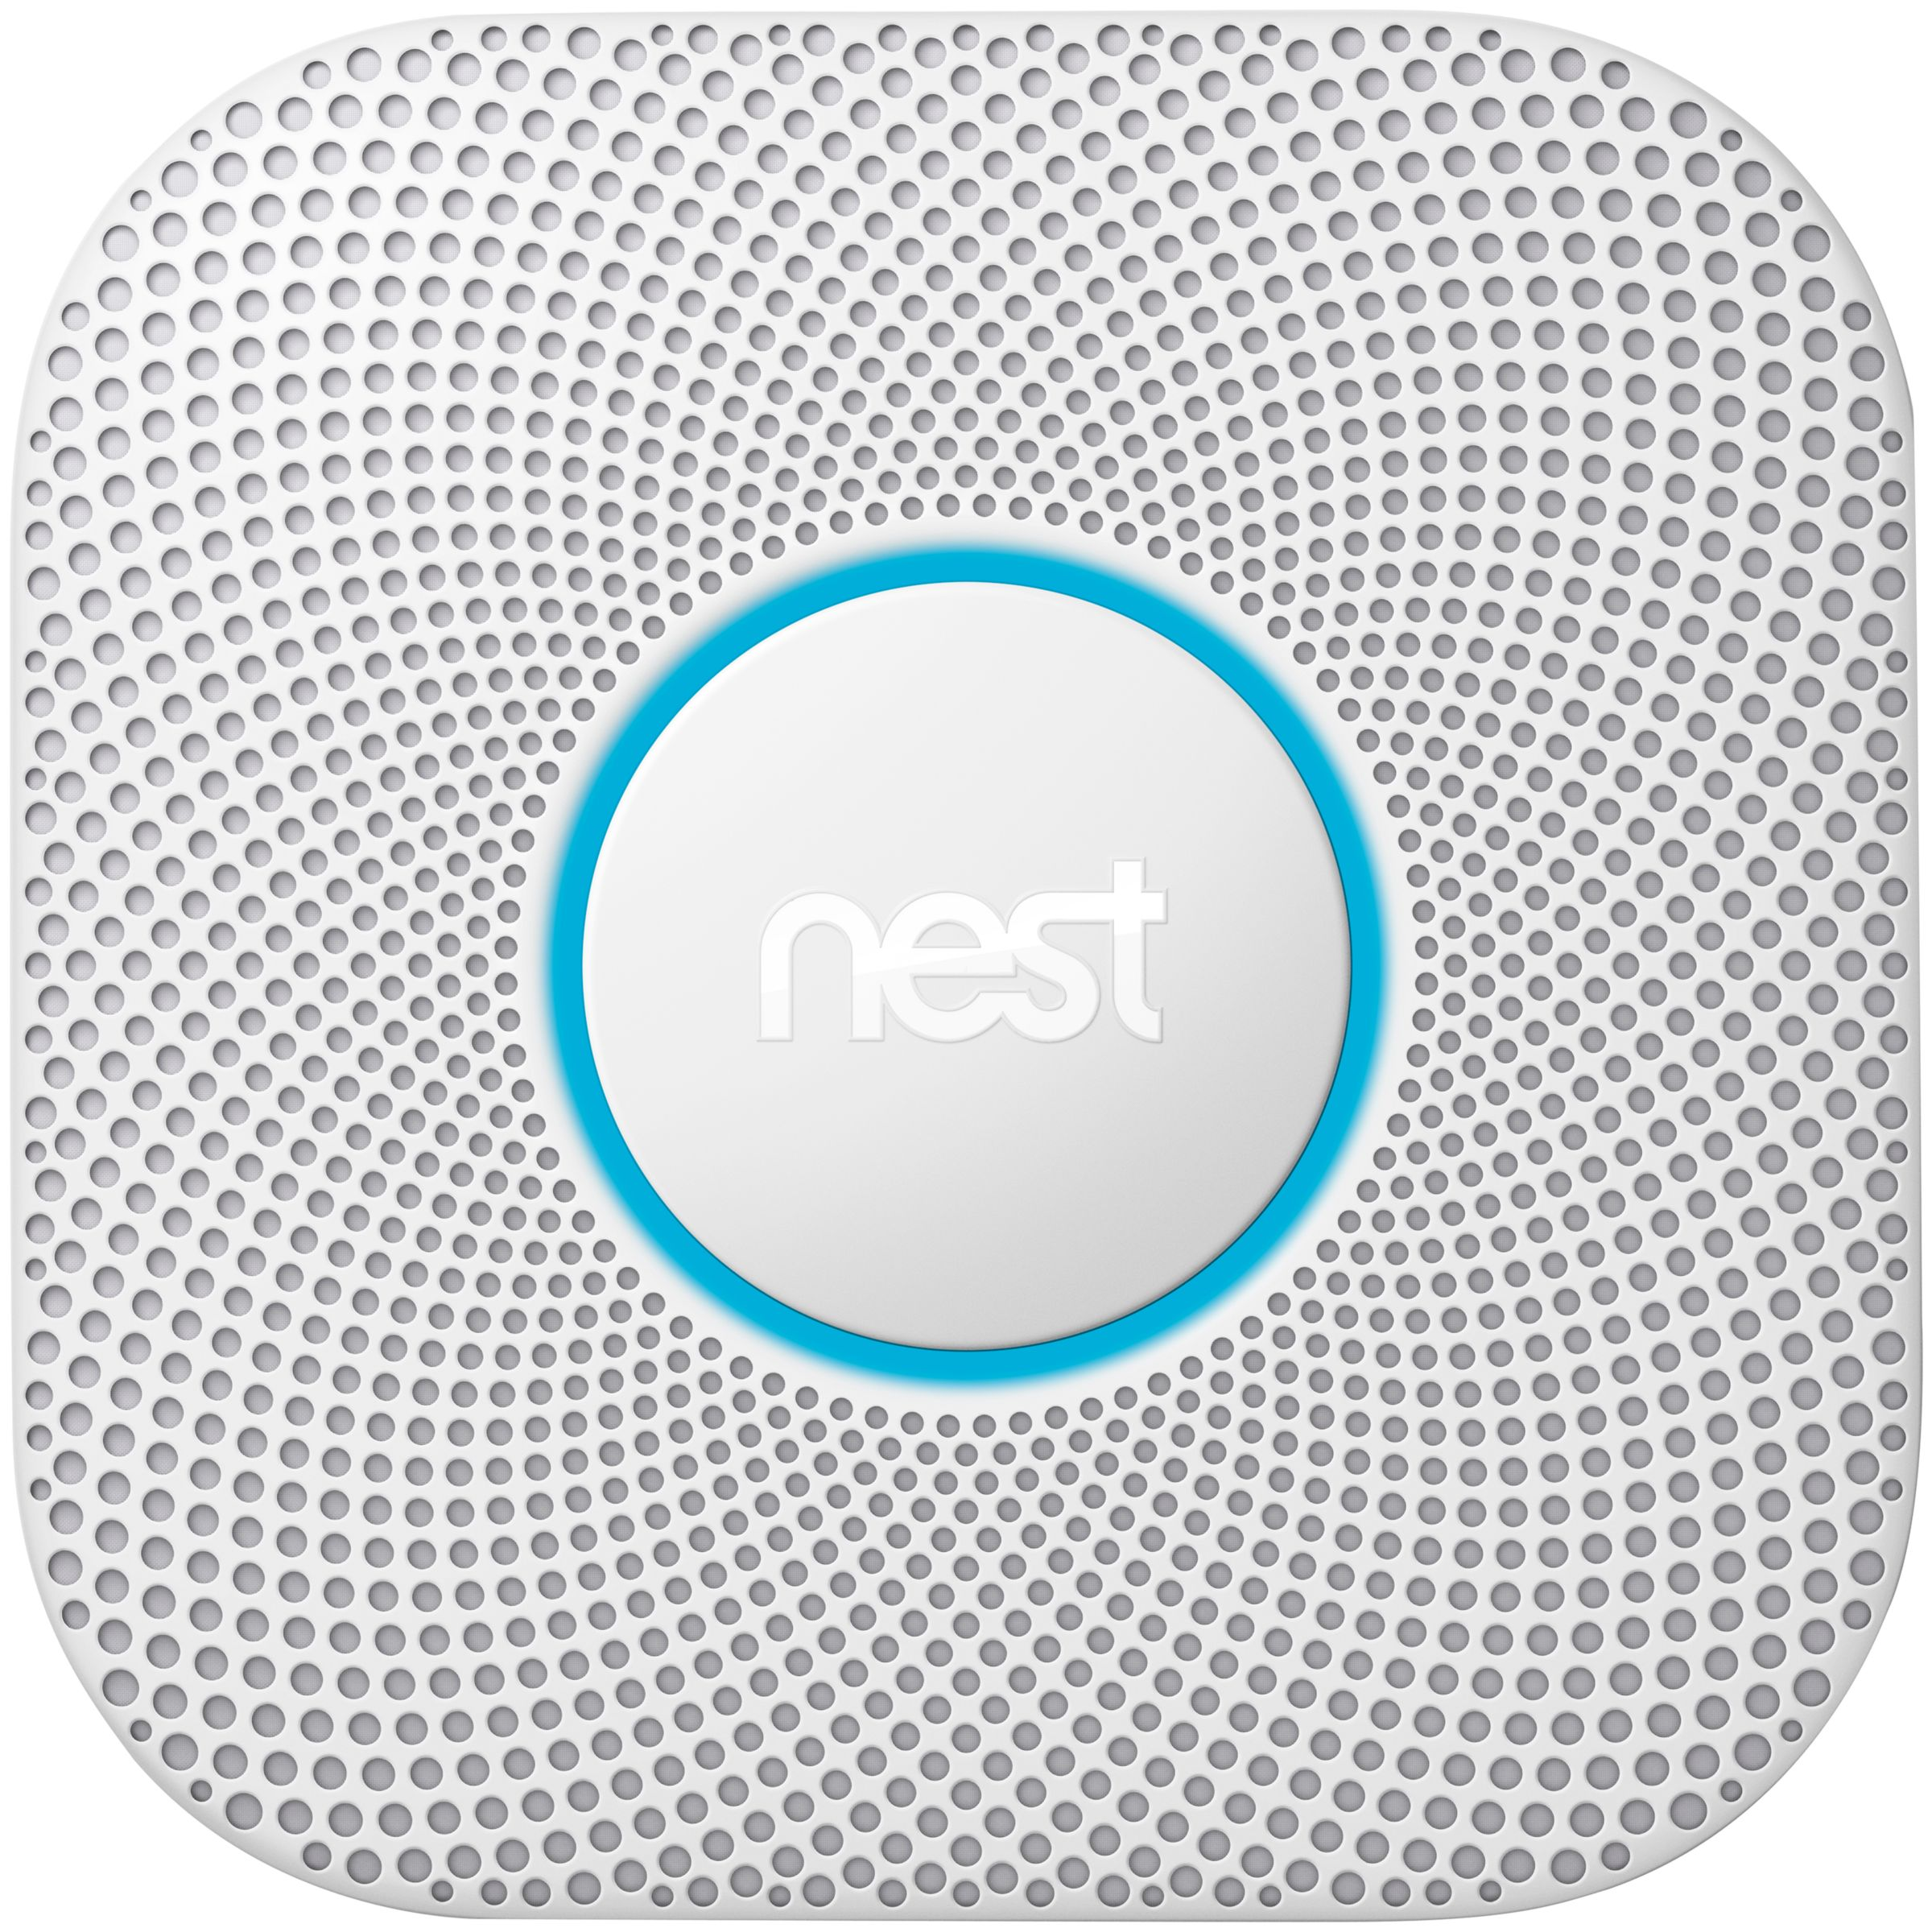 Nest Nest Protect, Smoke + Carbon Monoxide Alarm, Battery